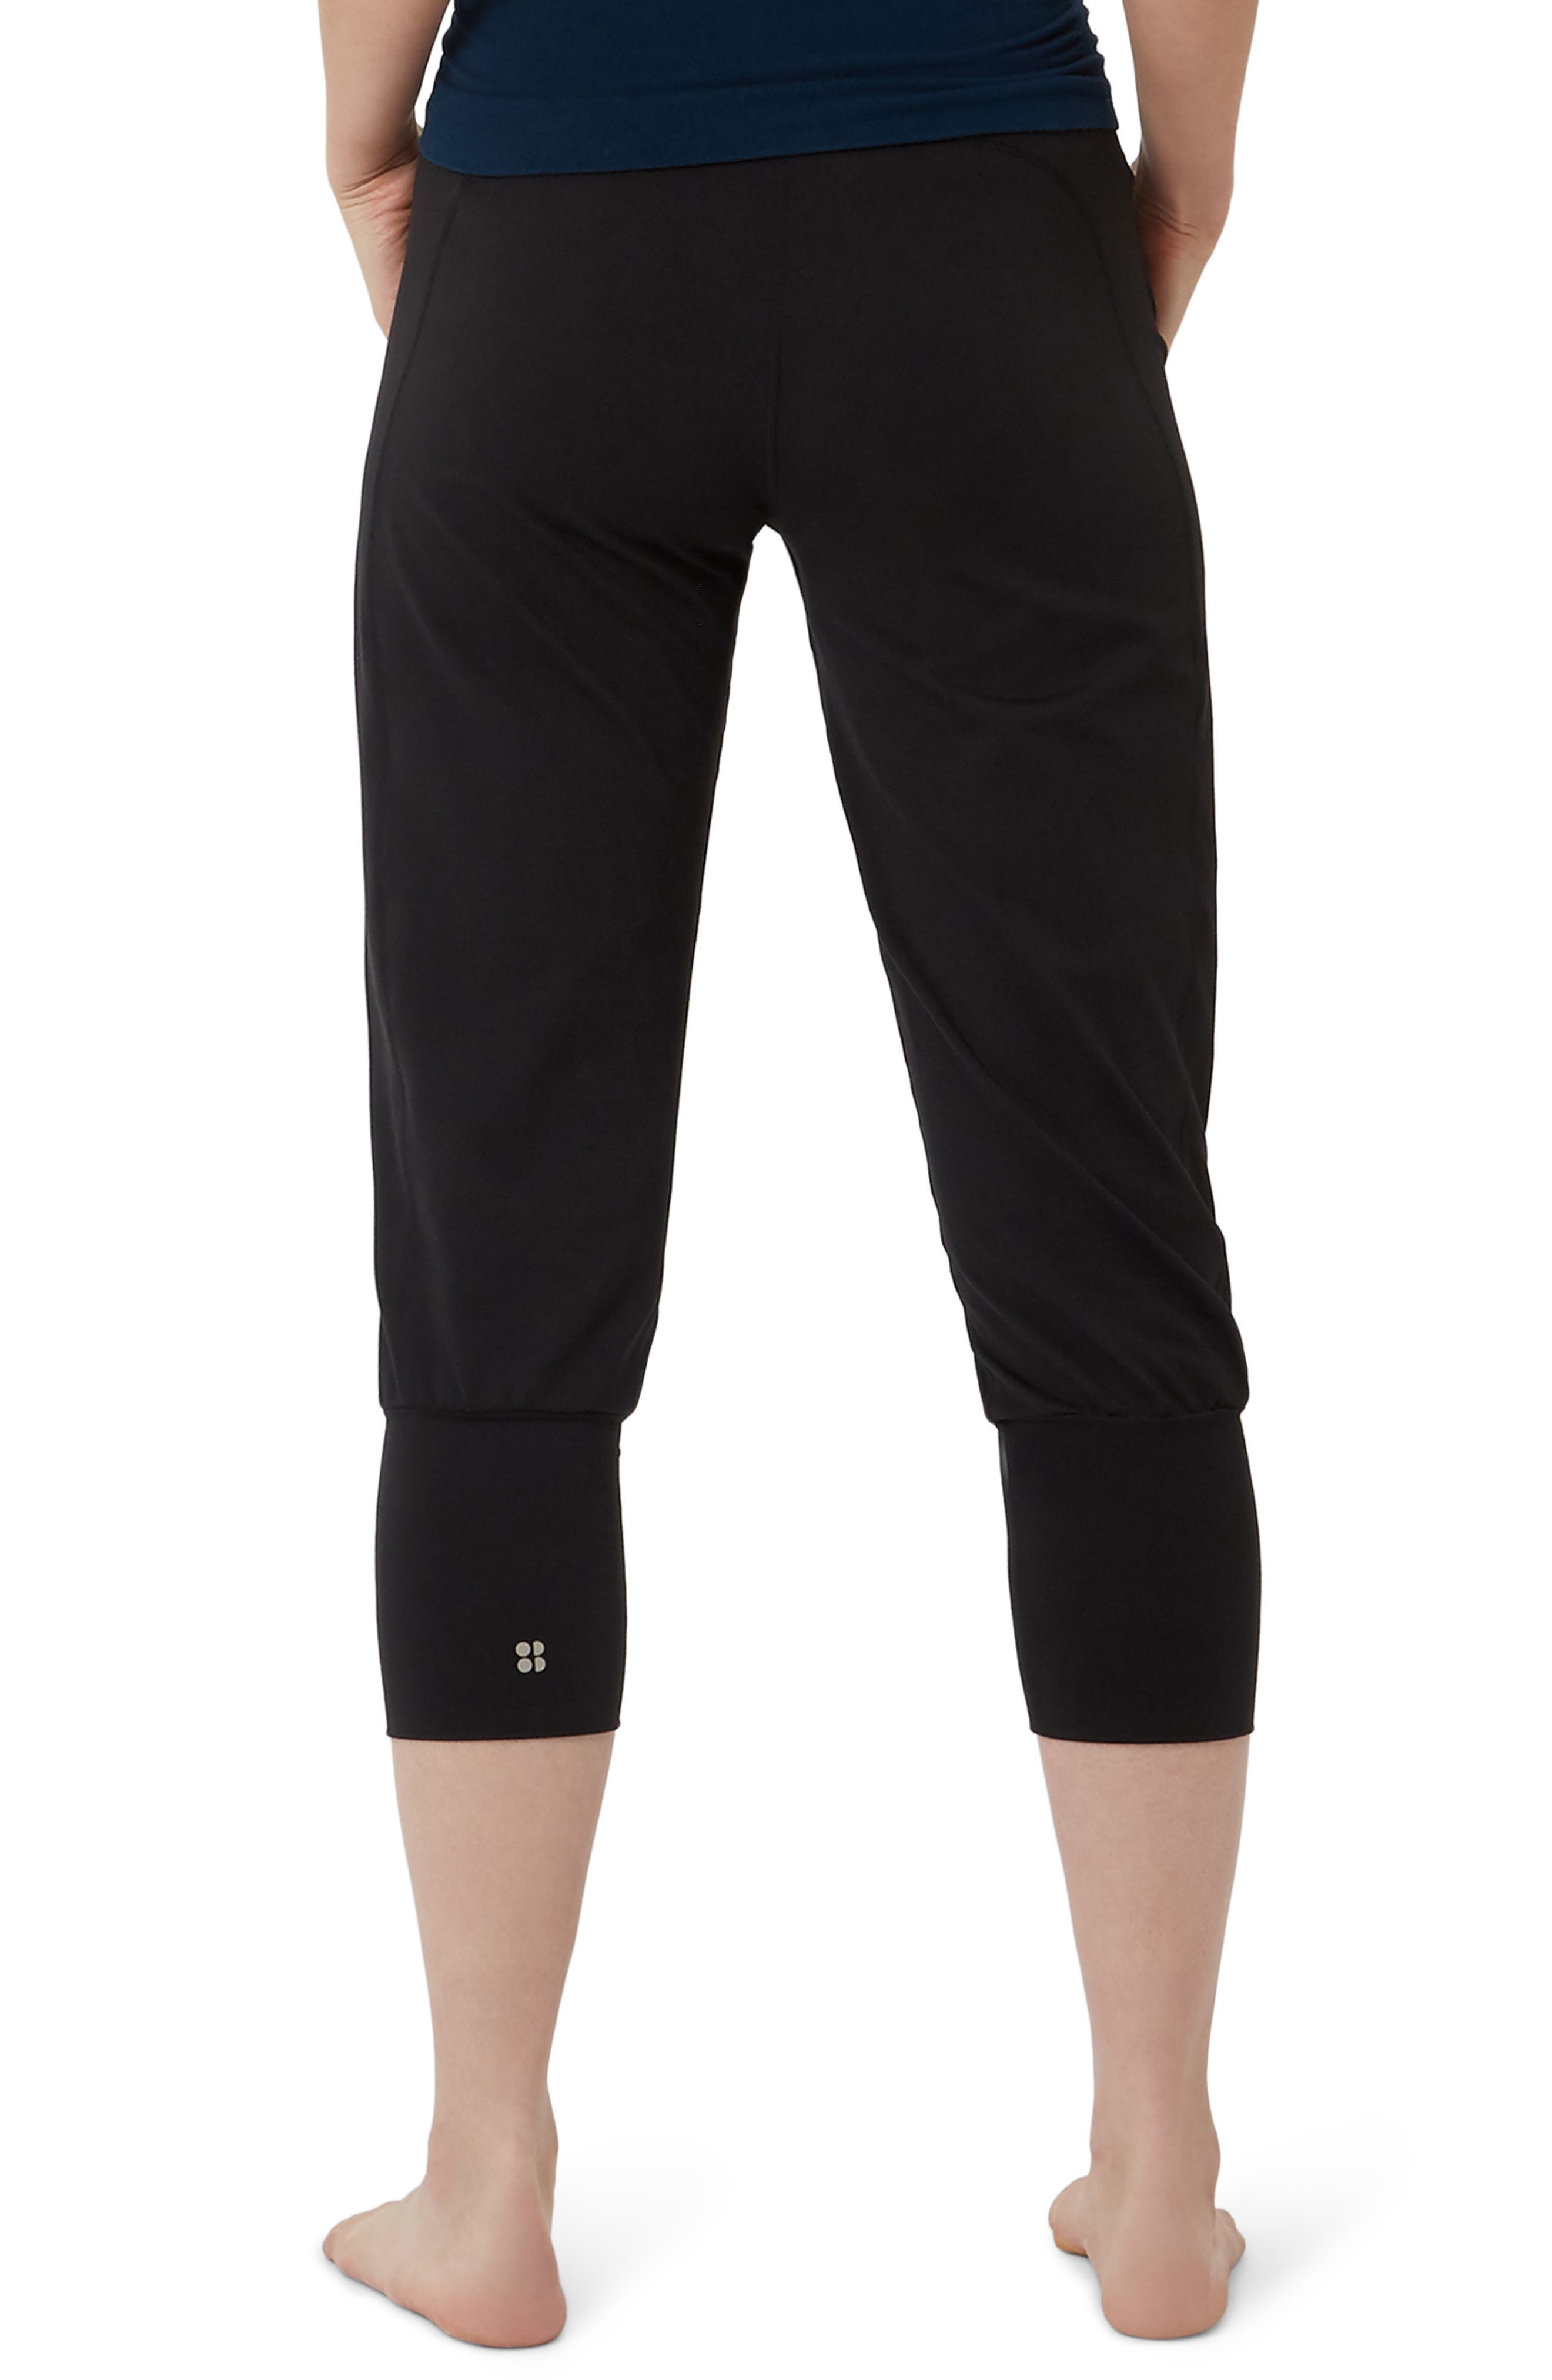 SWEATY BETTY, Garudasana Crop Yoga Trousers, Alternate thumbnail 2, color, BLACK